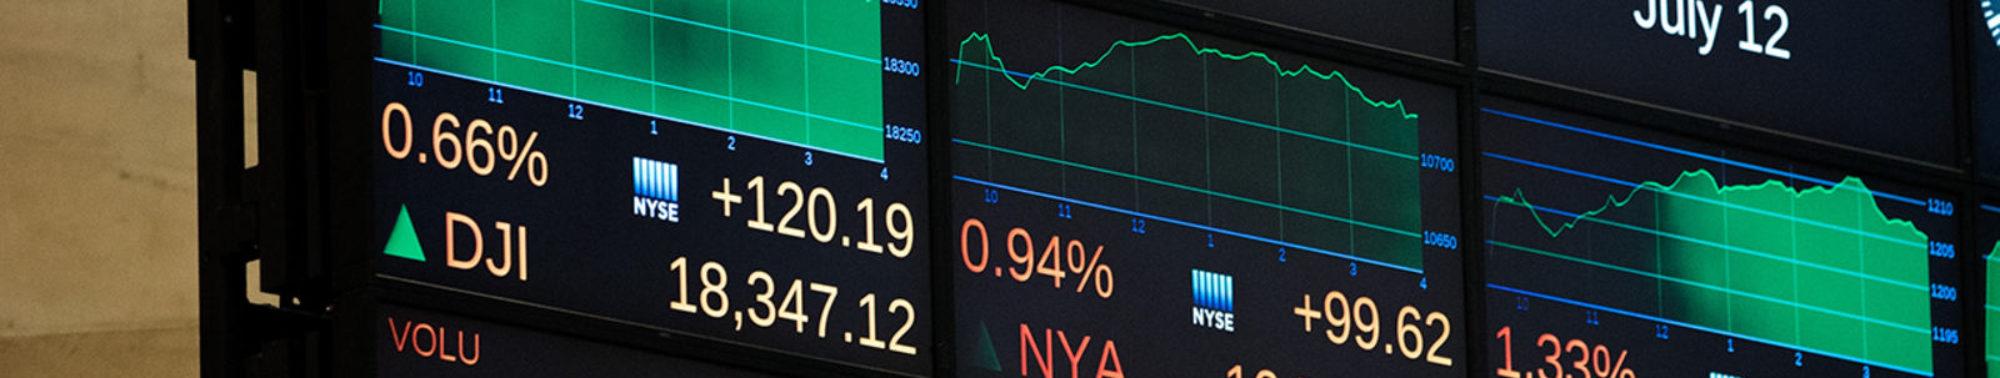 Low Risk, High Reward, Informed Financials